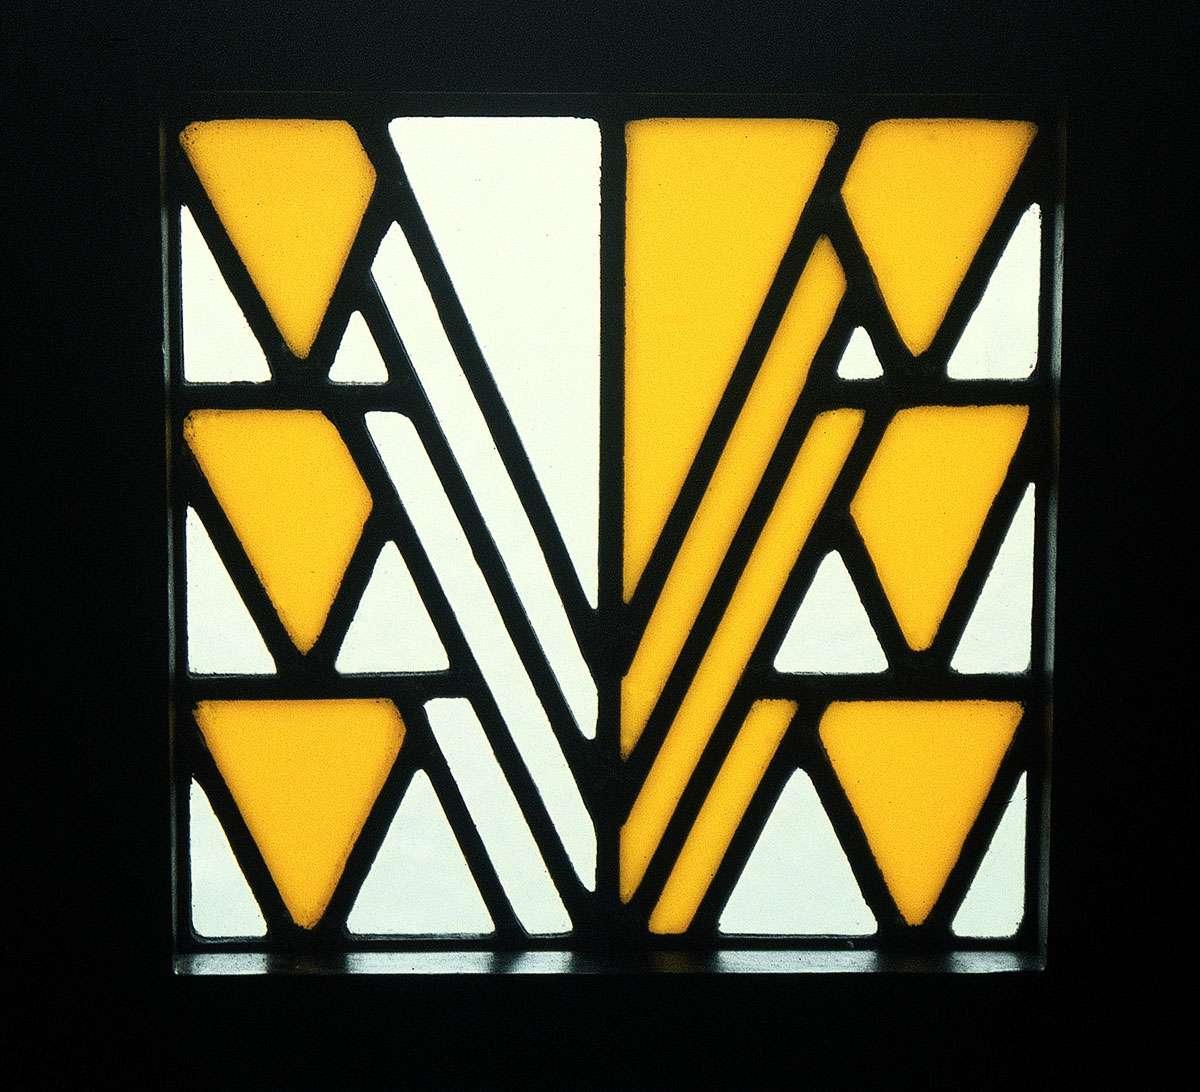 Leaded glass, 78 Derngate, Northampton. Photo: 78 Derngate